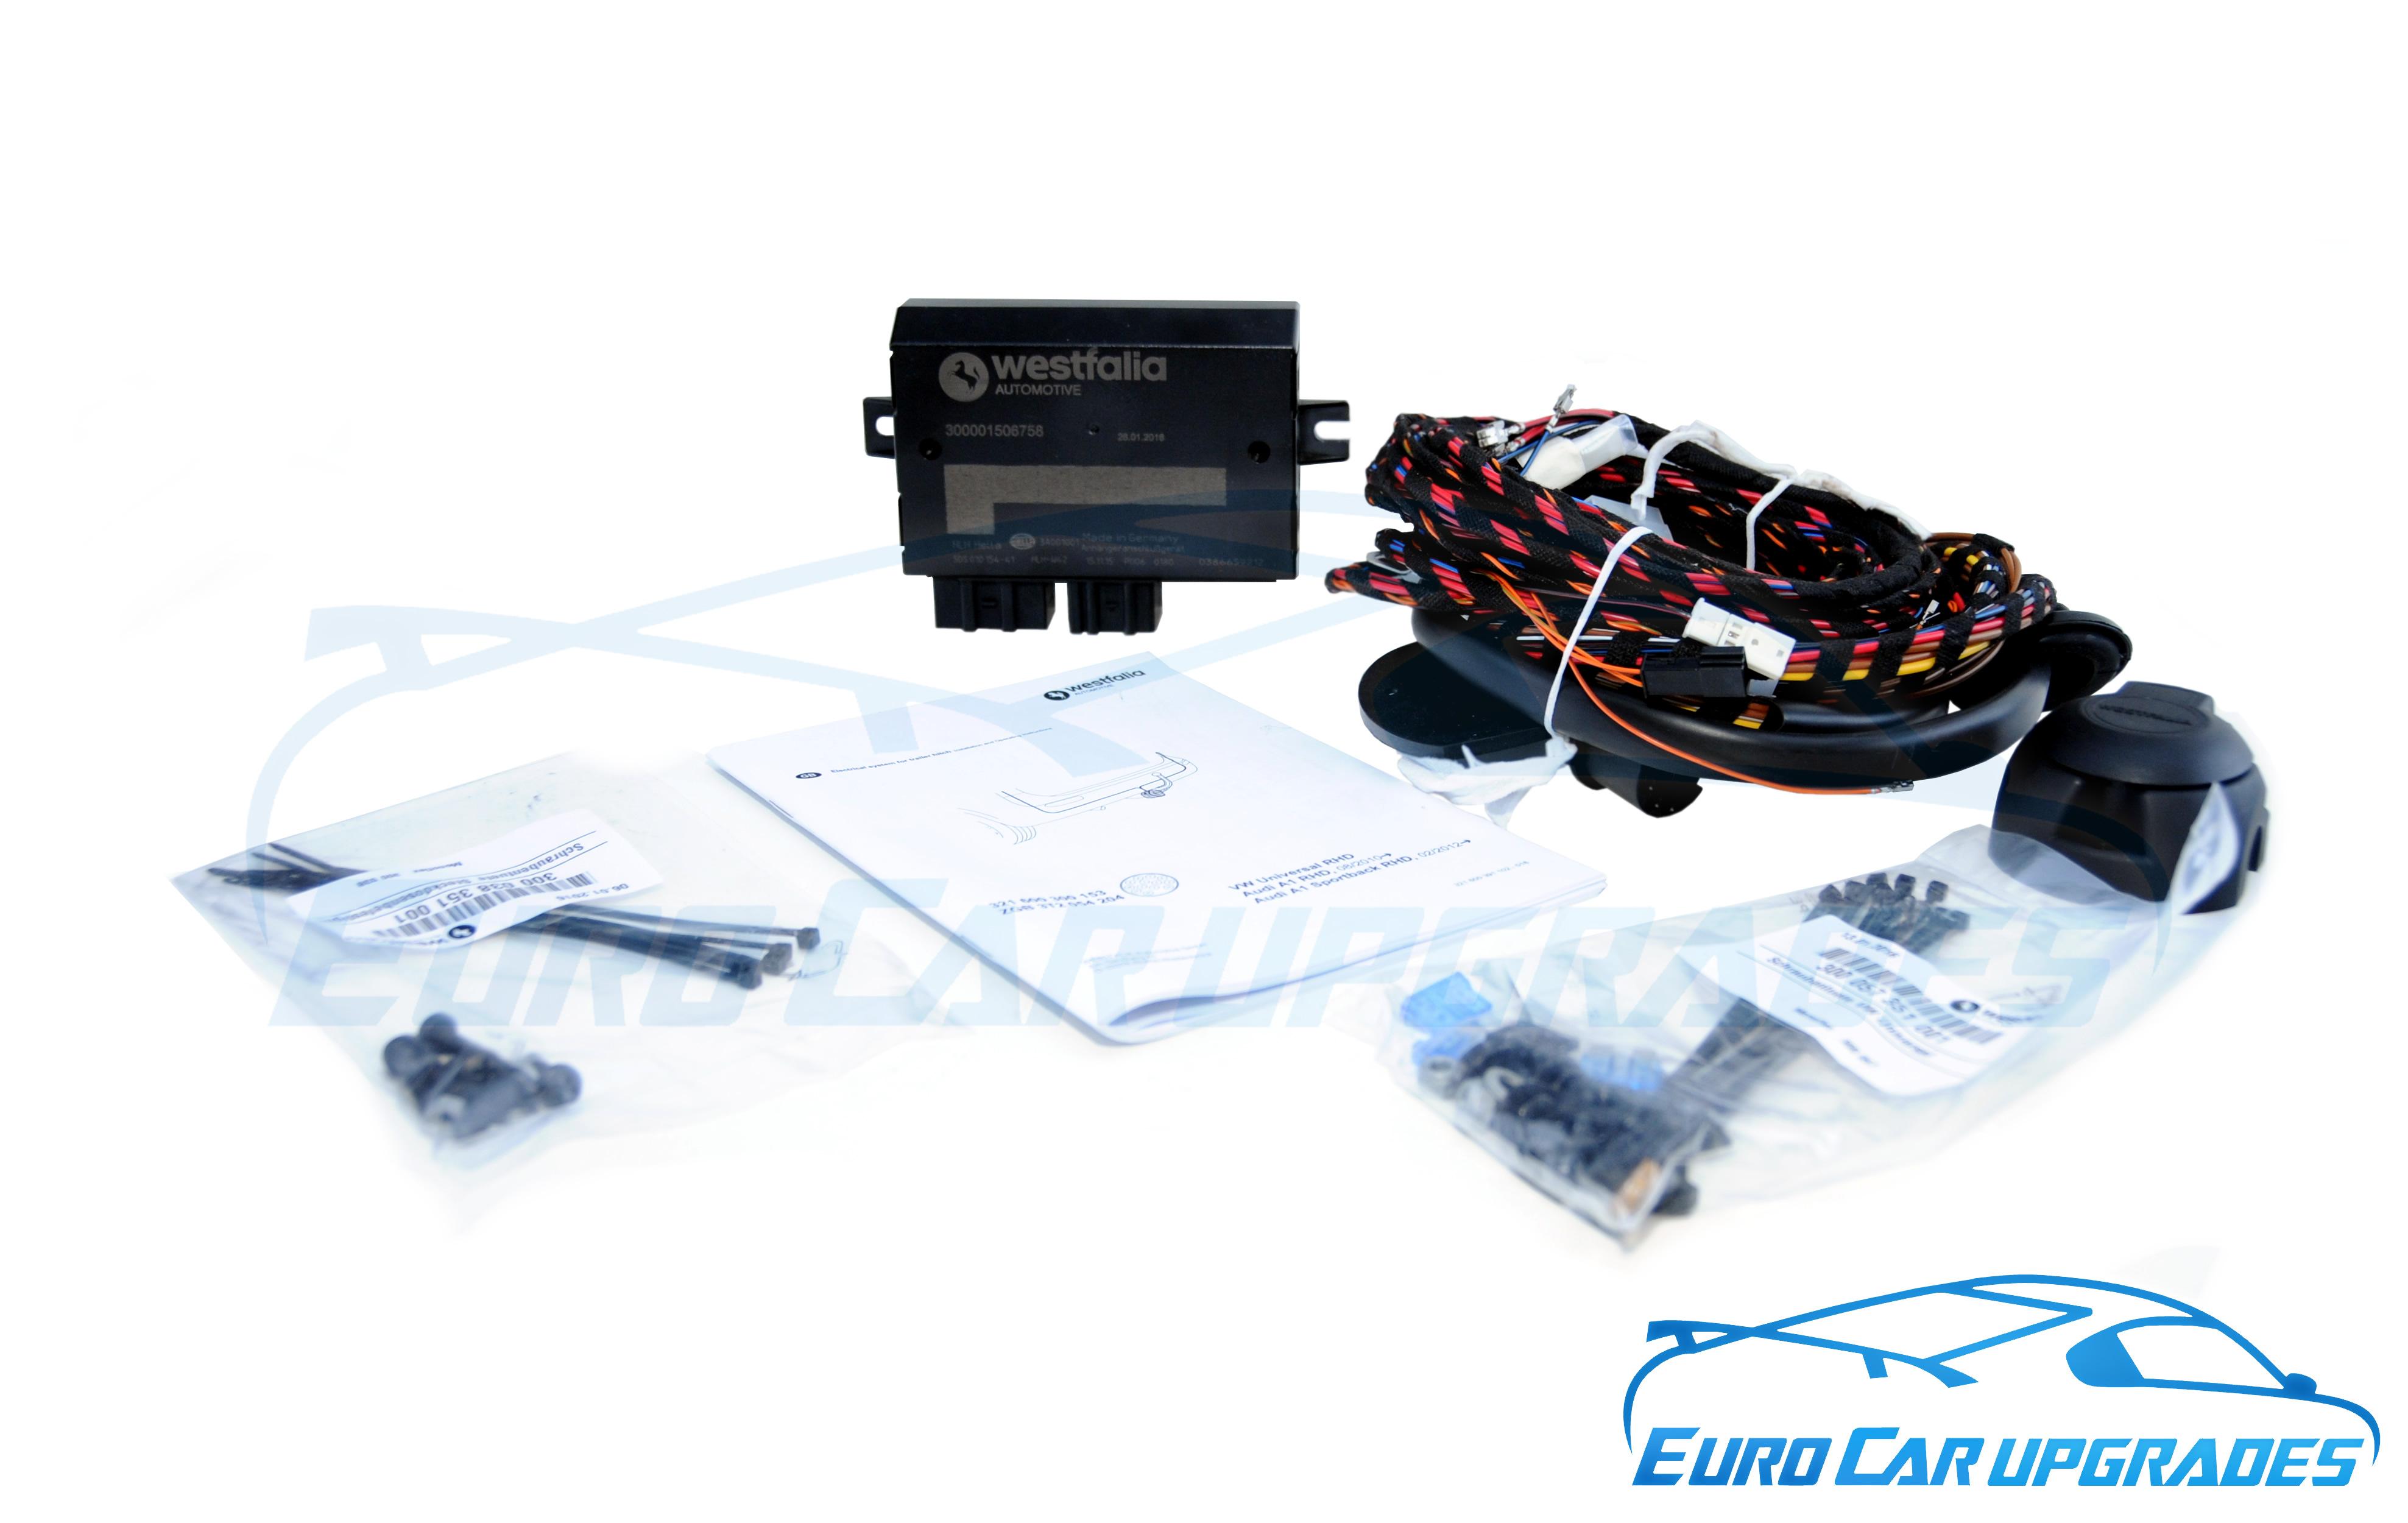 audi a1 tow bar wiring kit 13 pin wiring module kit led rh australiatowbars com au westfalia detachable towbar fitting instructions